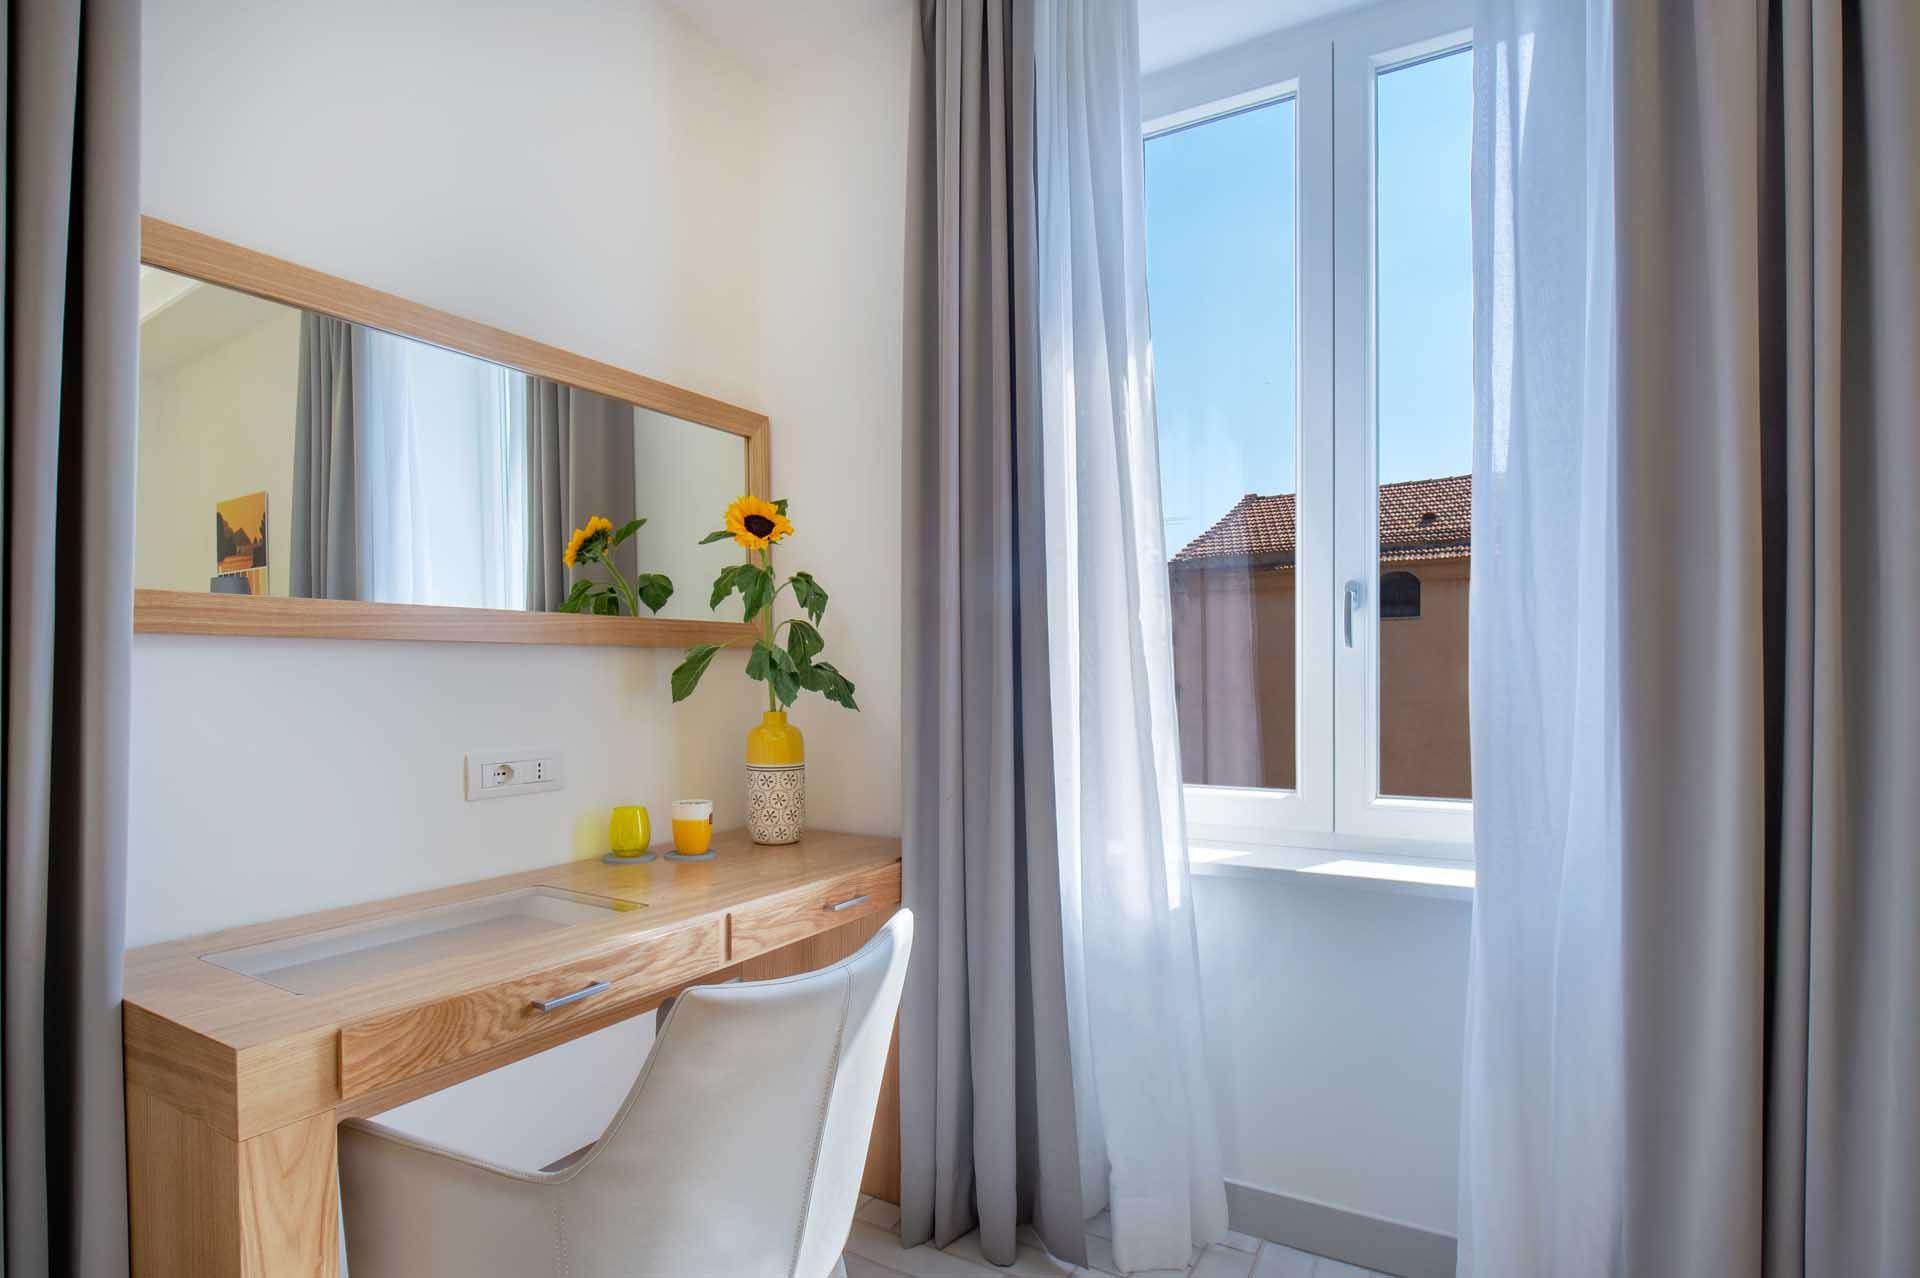 Mediterranean Suites Old Town